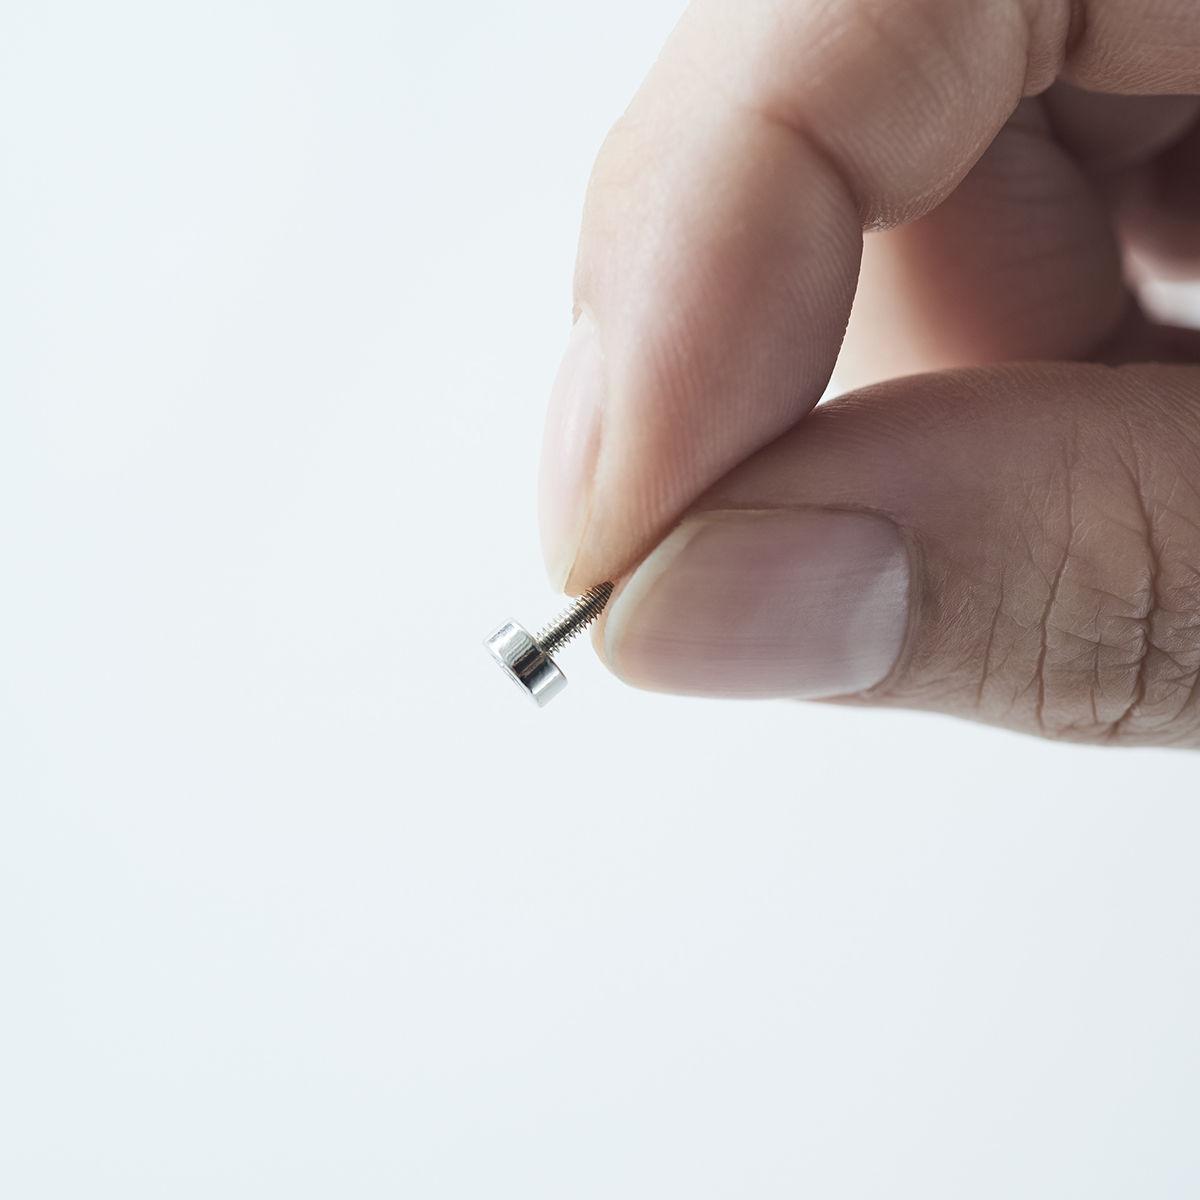 【 φ4.5 MAGNET 10個入 】とても小さくて強いマグネット